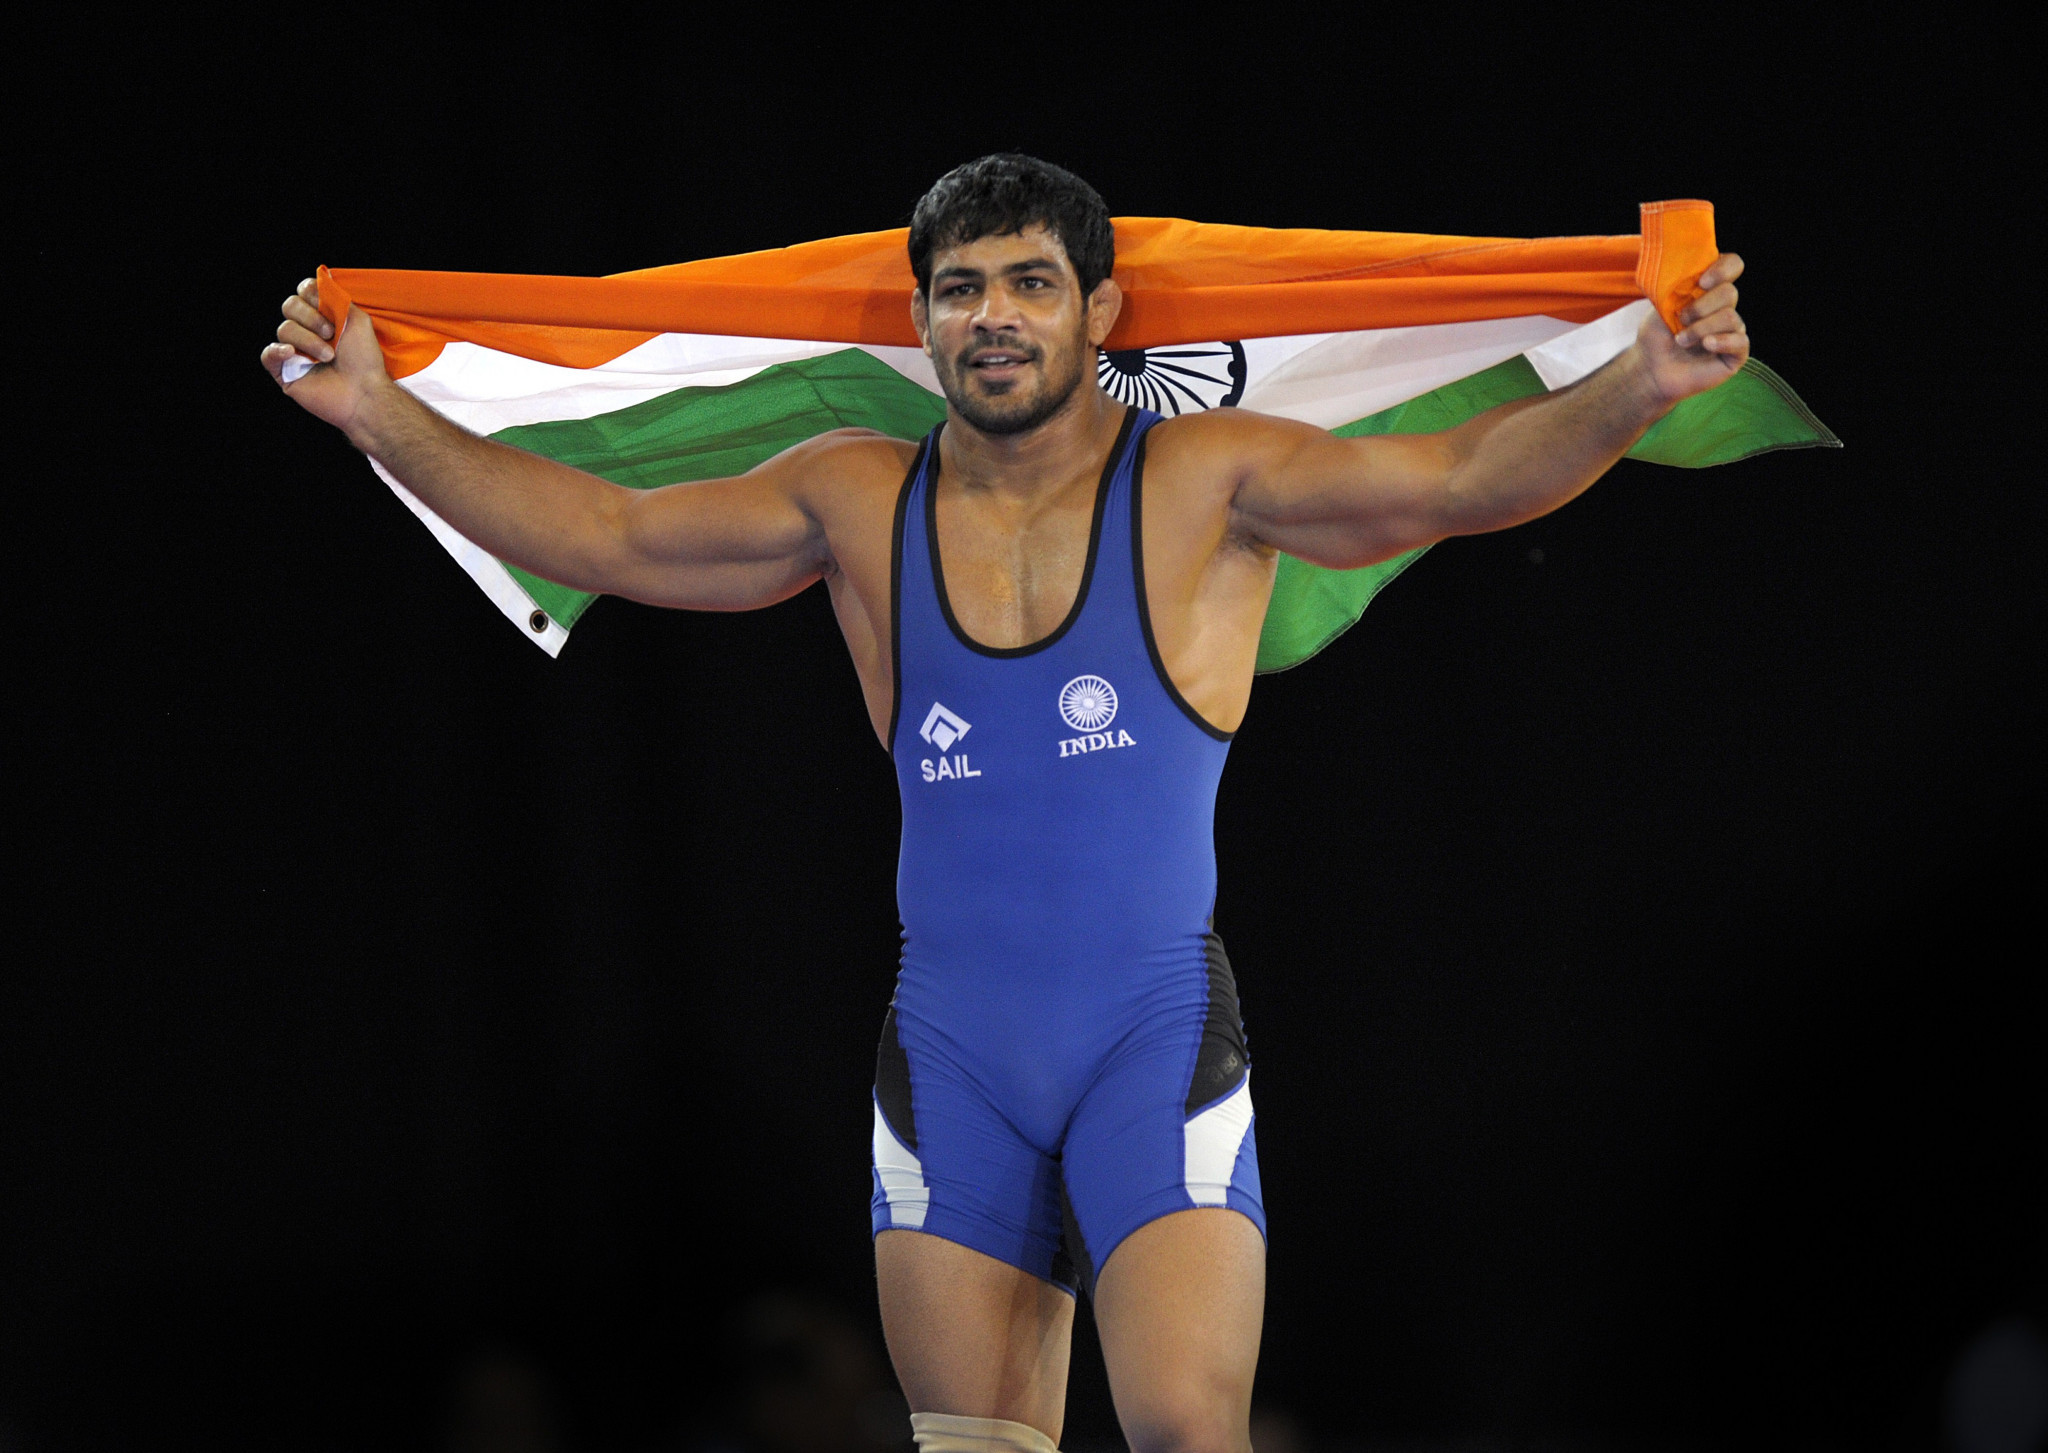 Olympic medallist Kumar denied bail in murder case